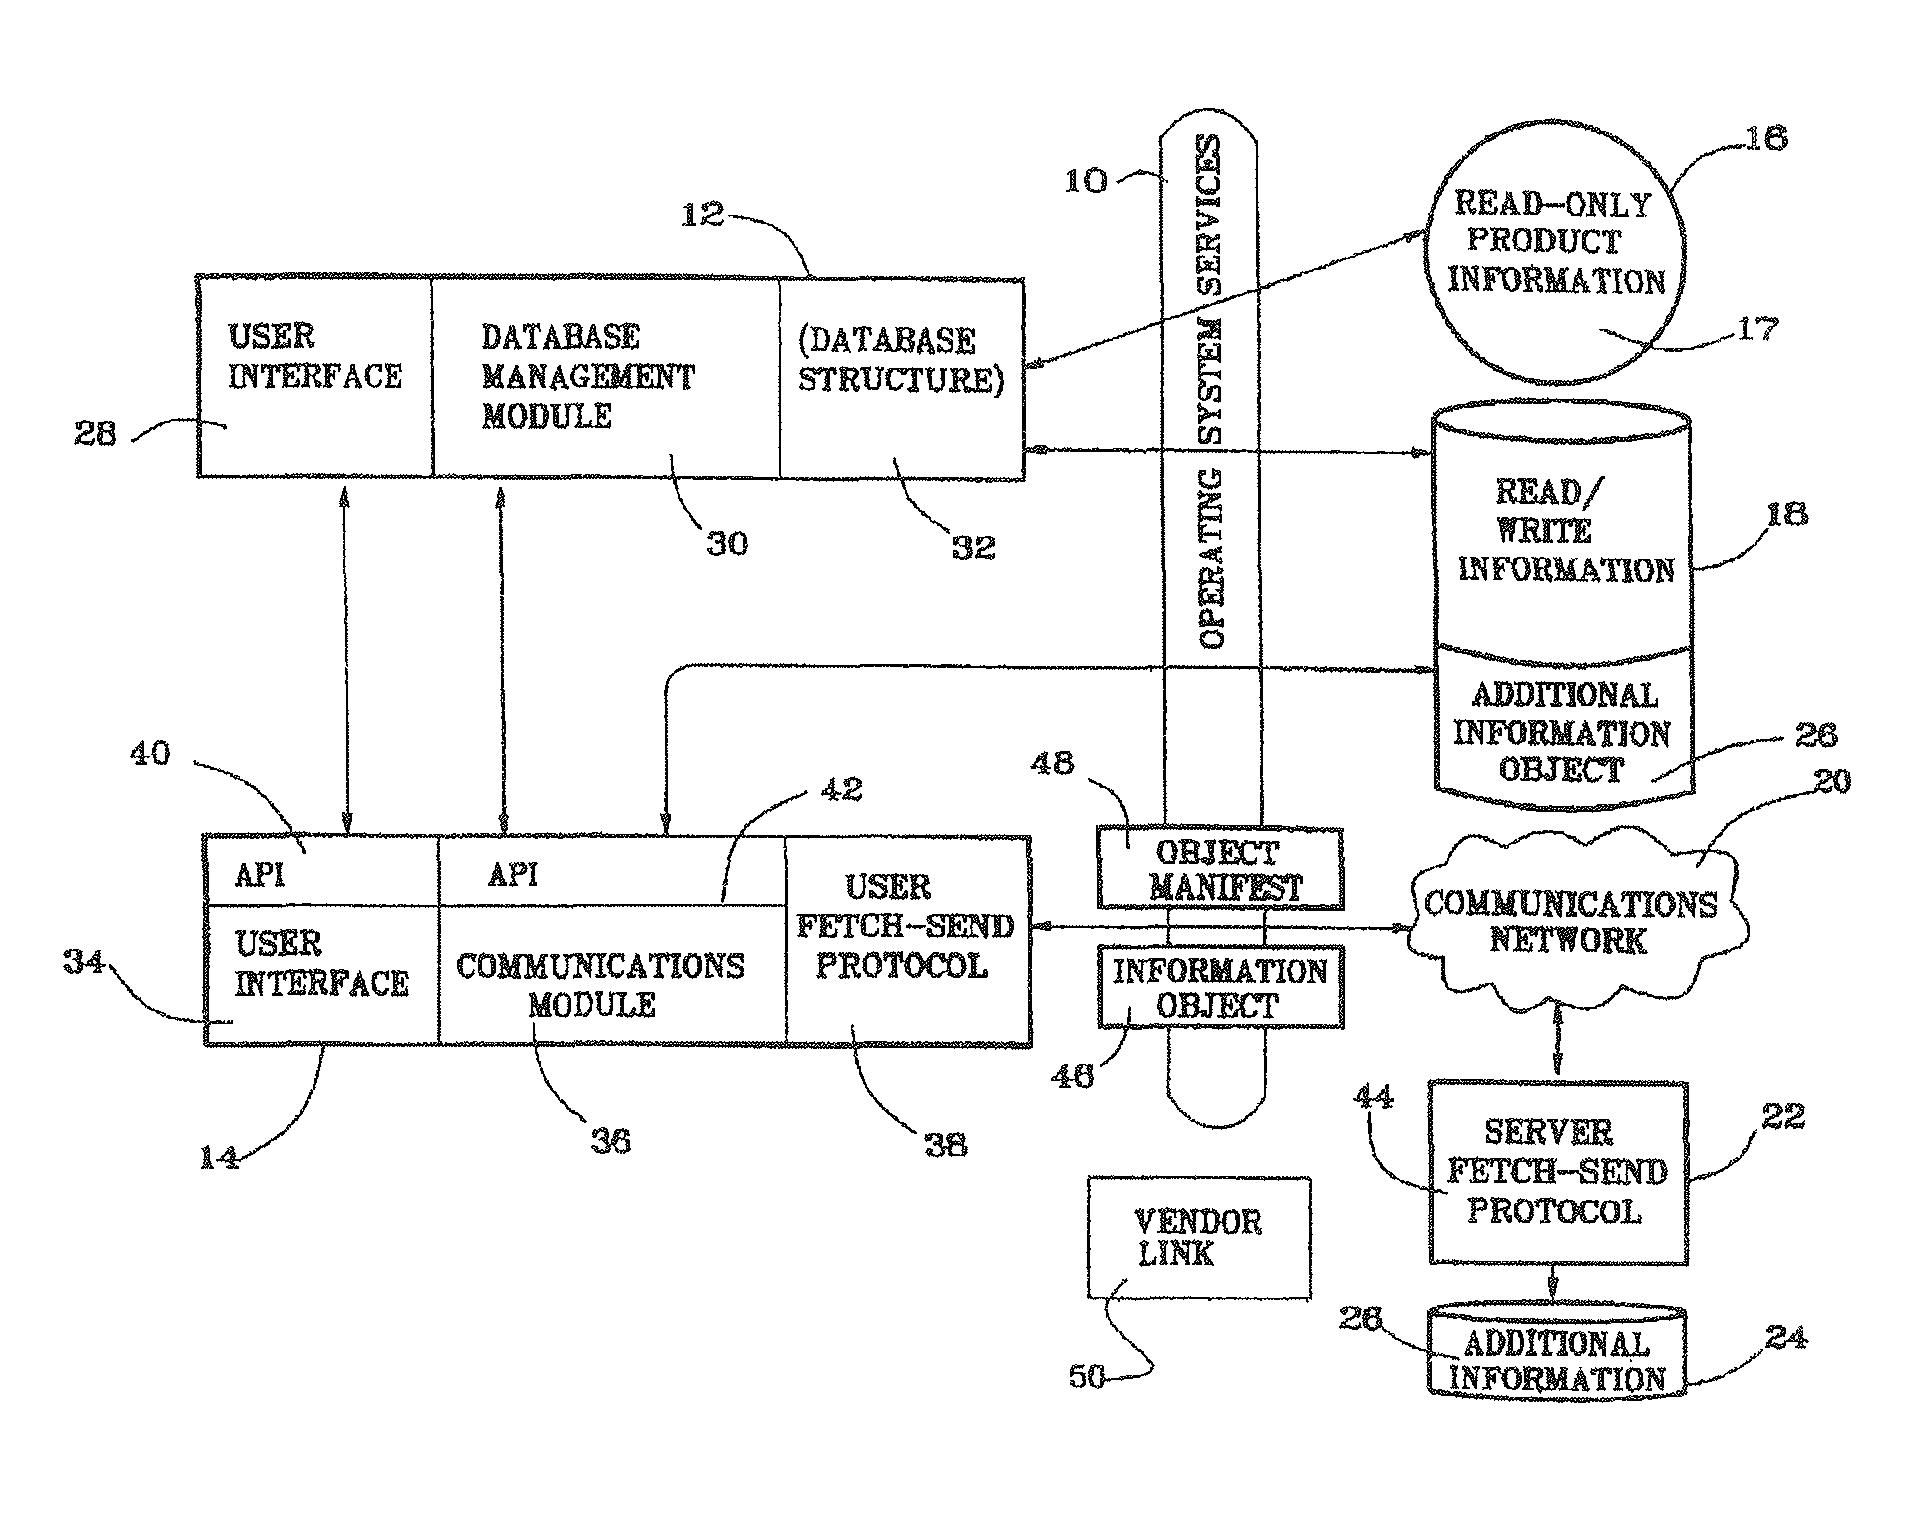 Patent US 9,484,077 B2